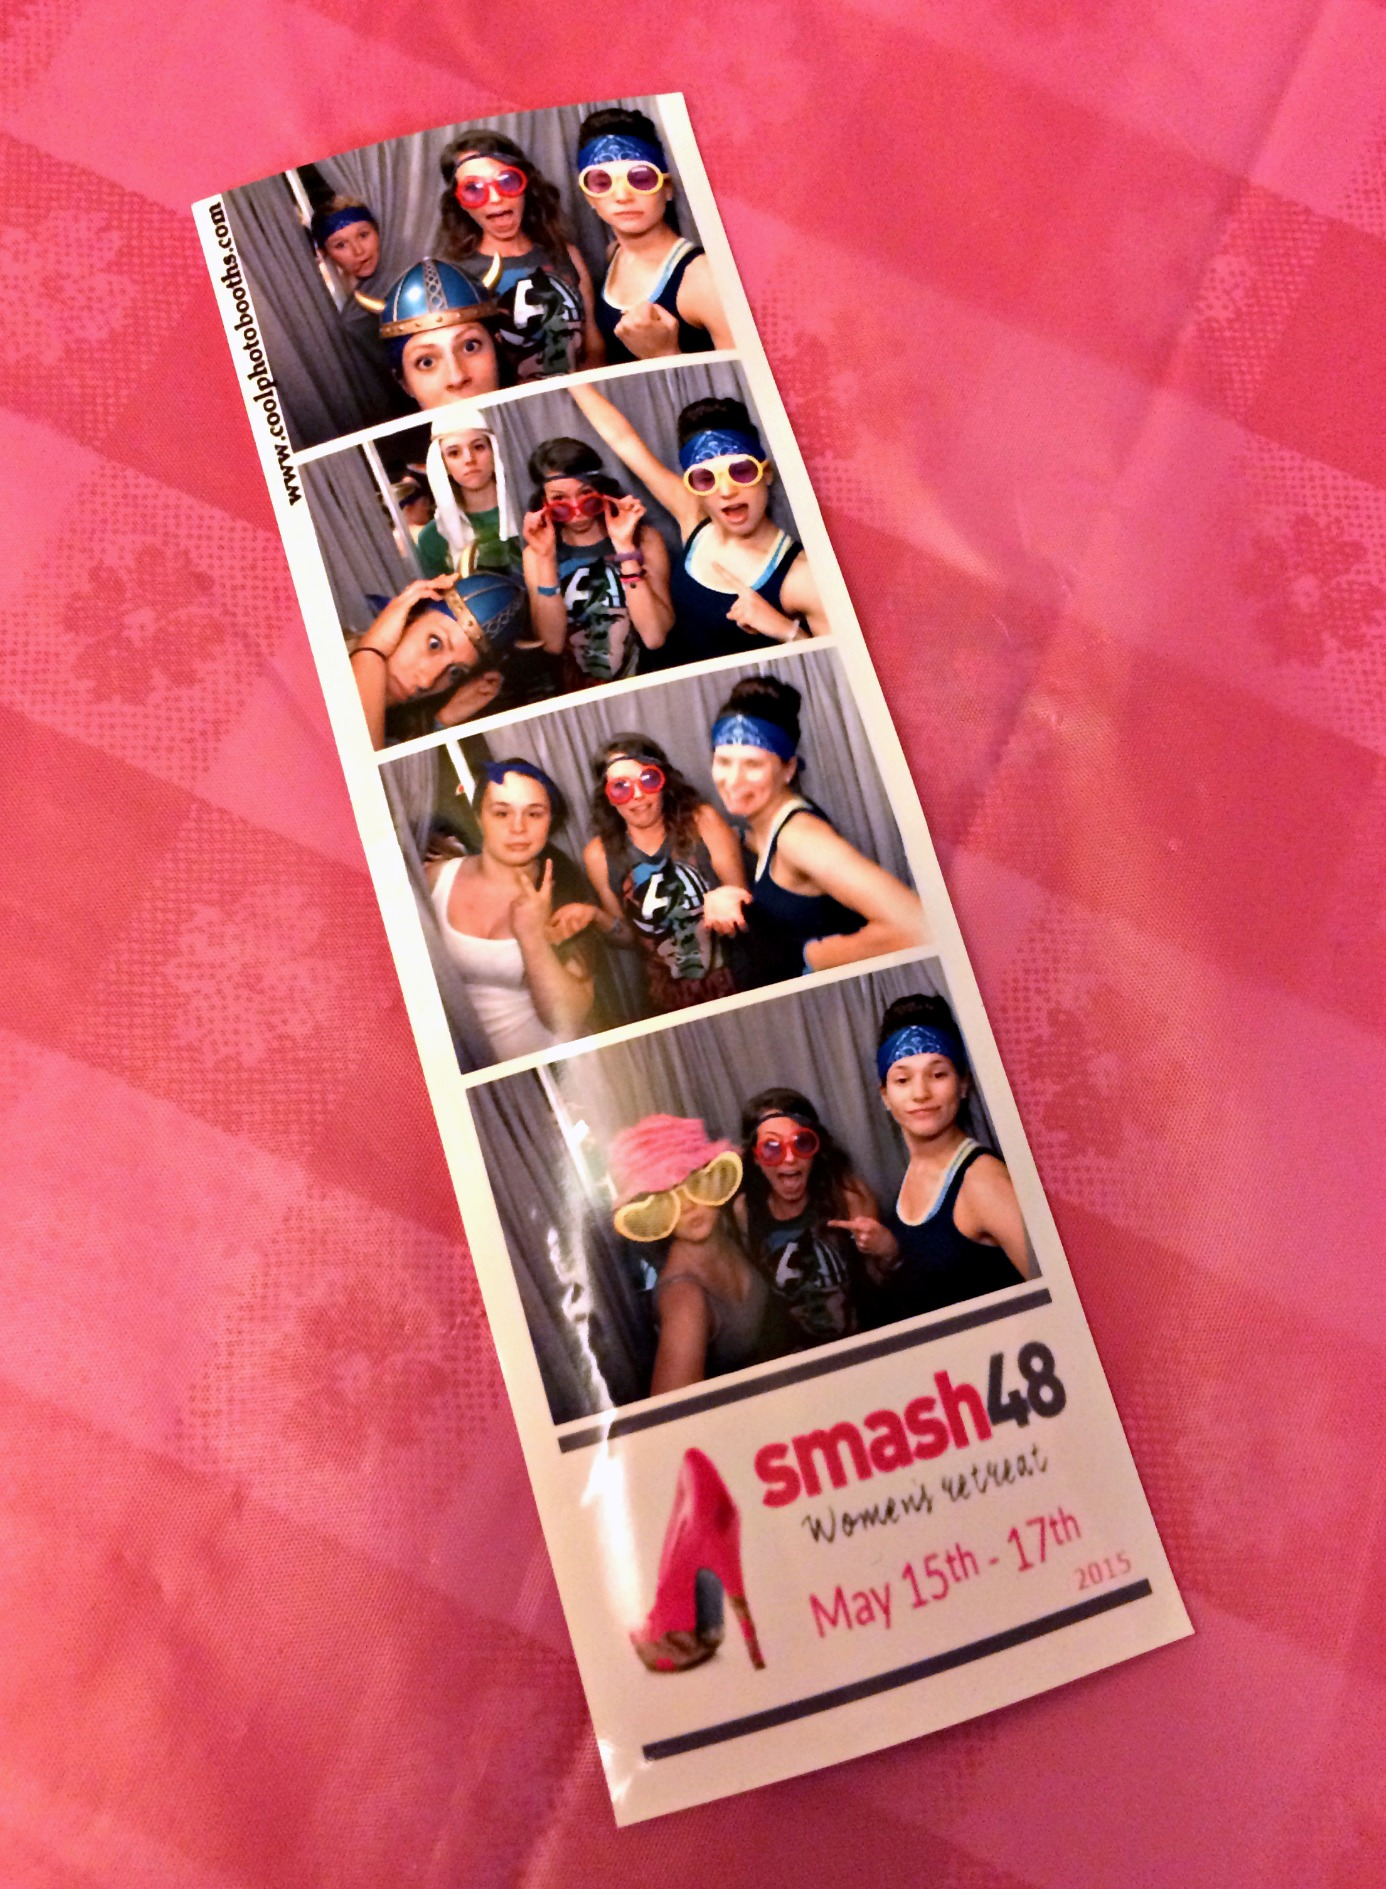 SMASH 48 photobooth